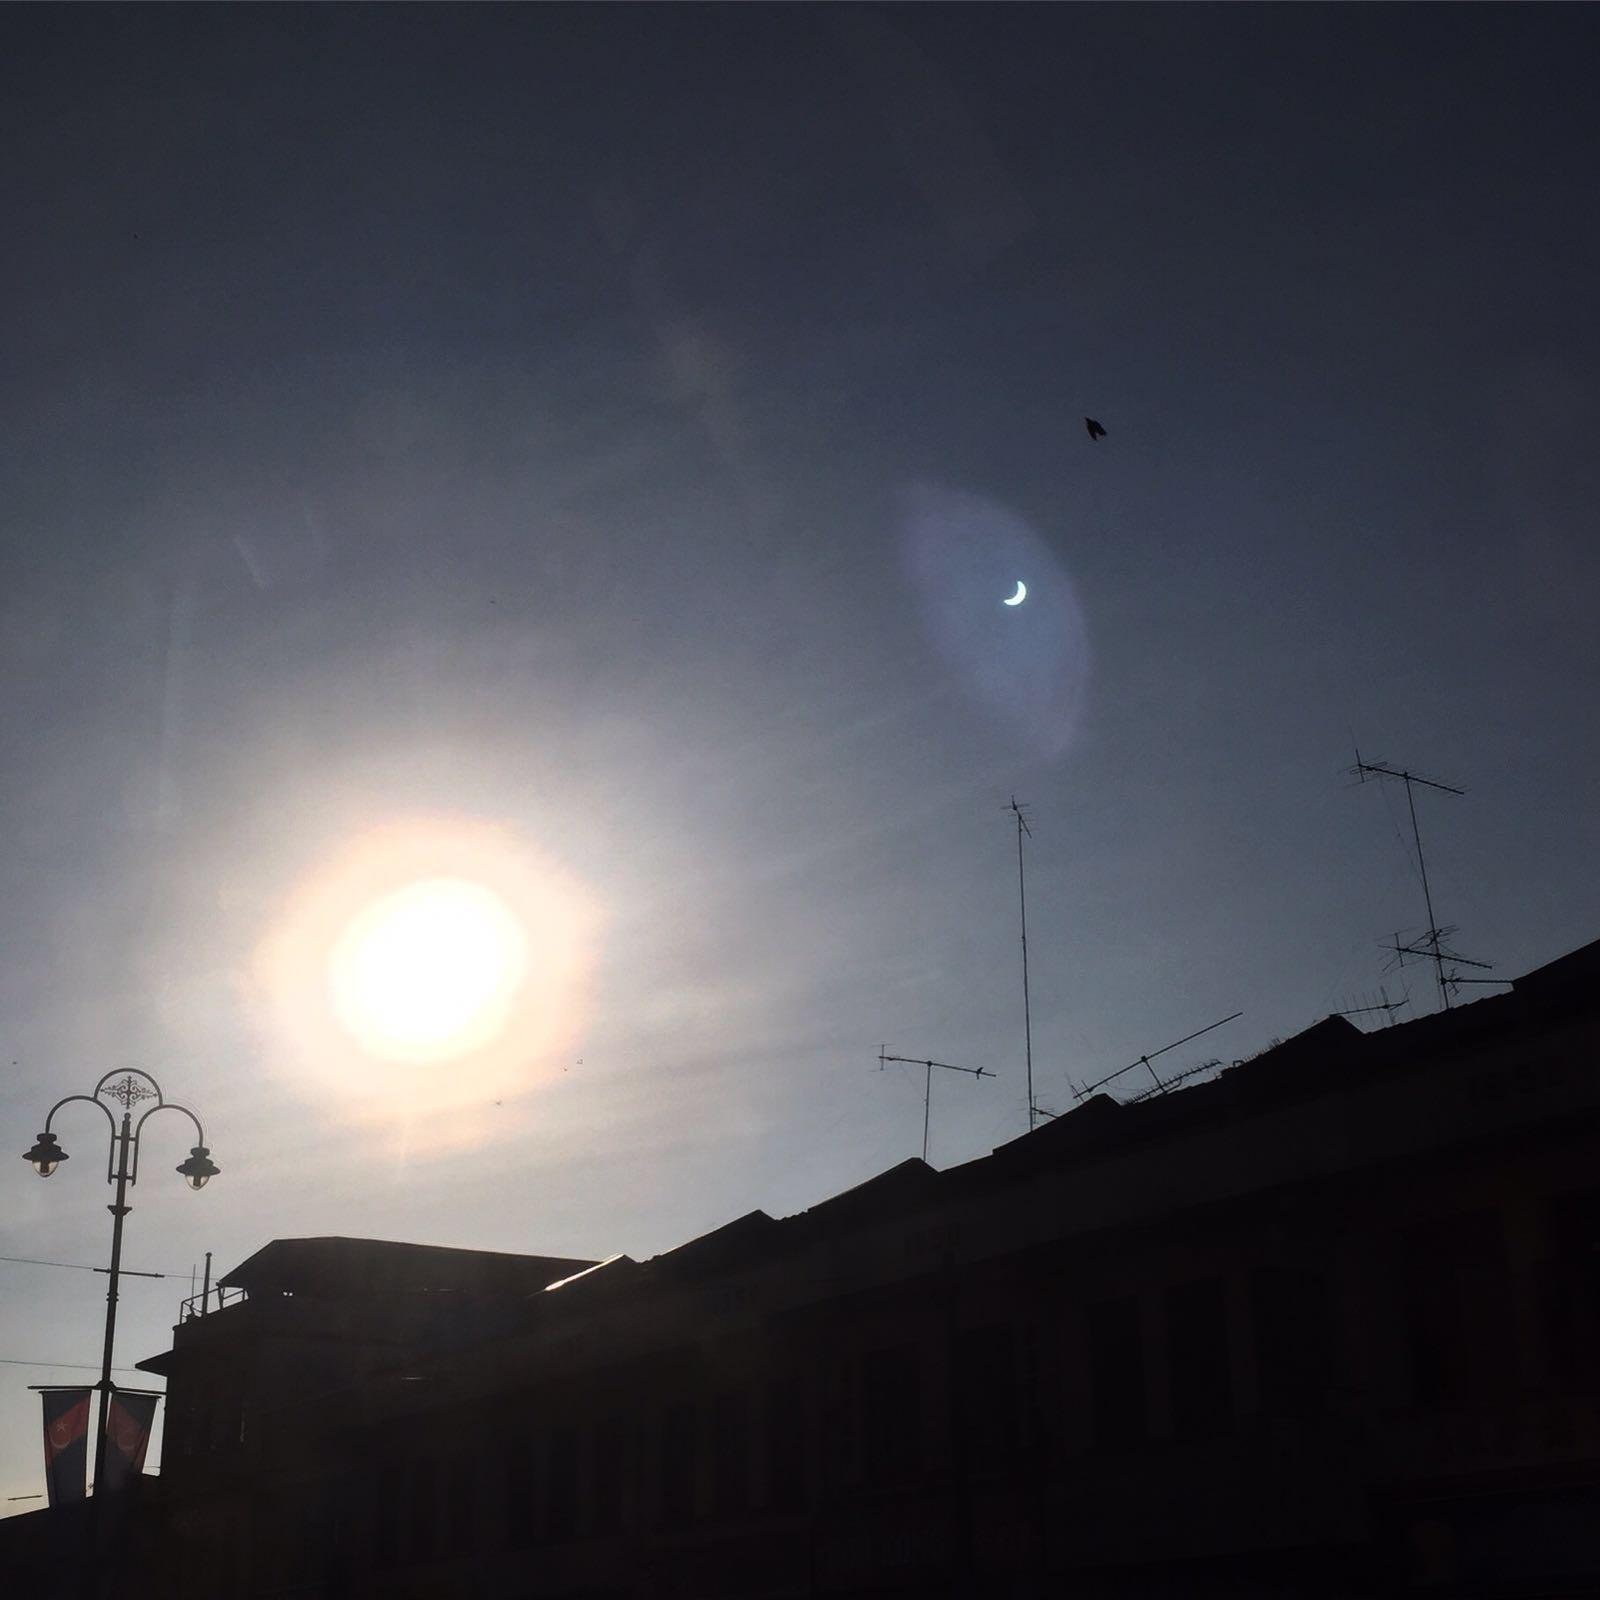 Gambar Gerhana Matahari 9 Mac 2016